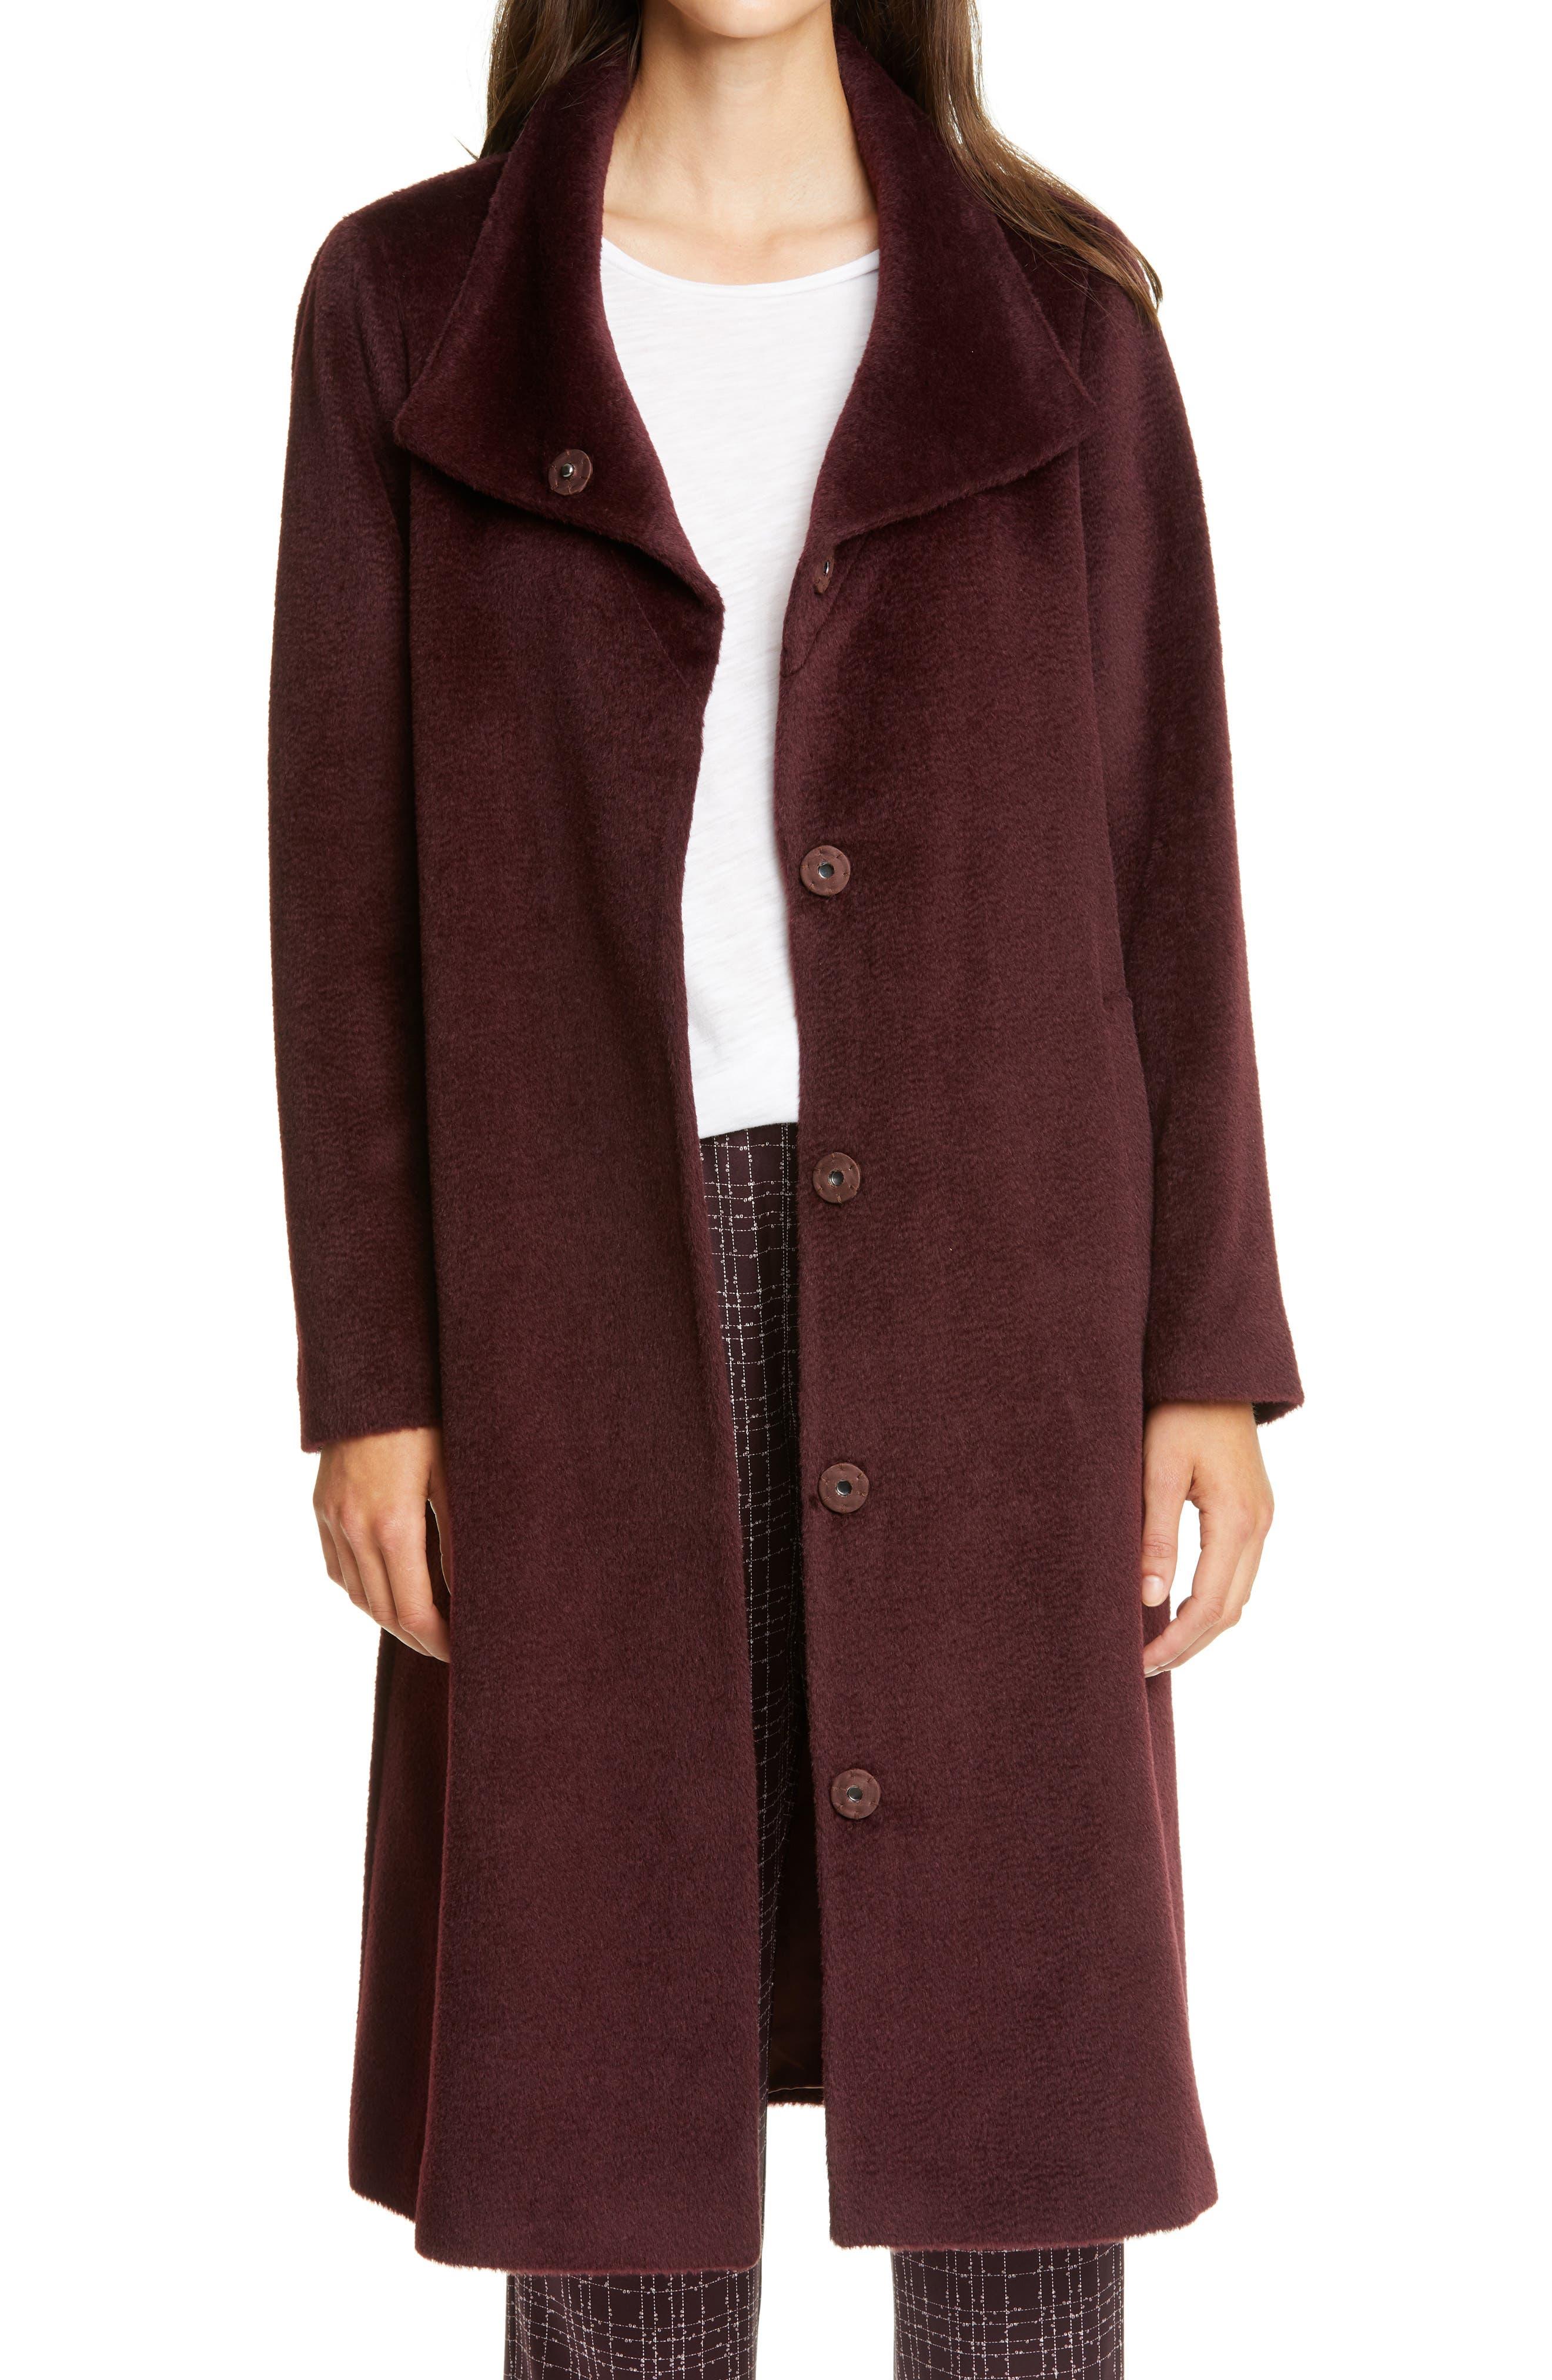 Image of Eileen Fisher High Collar Coat